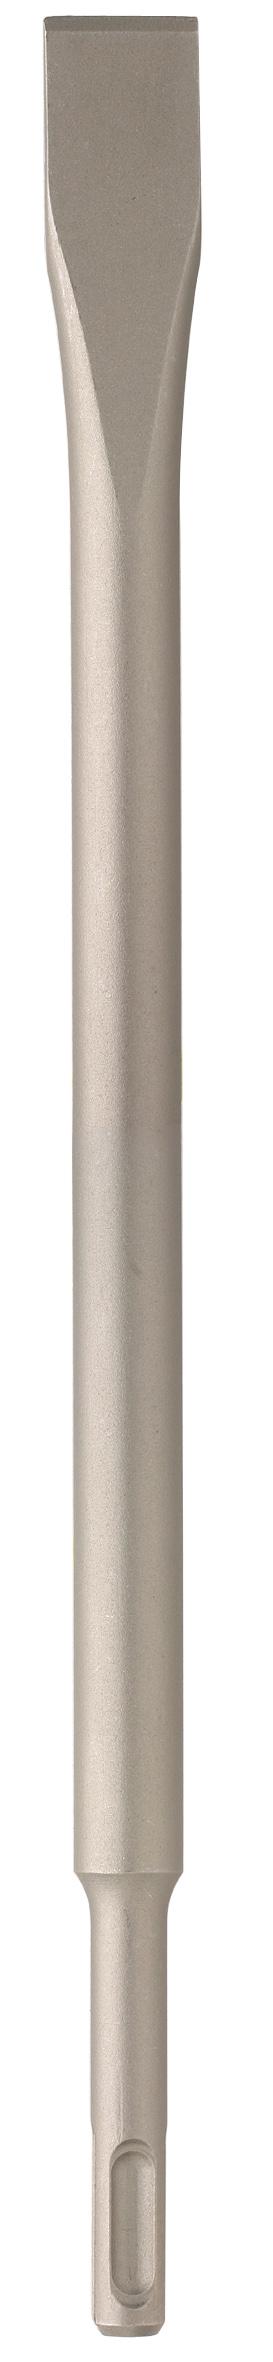 Spademeisel Diager SDS-plus 250 mm